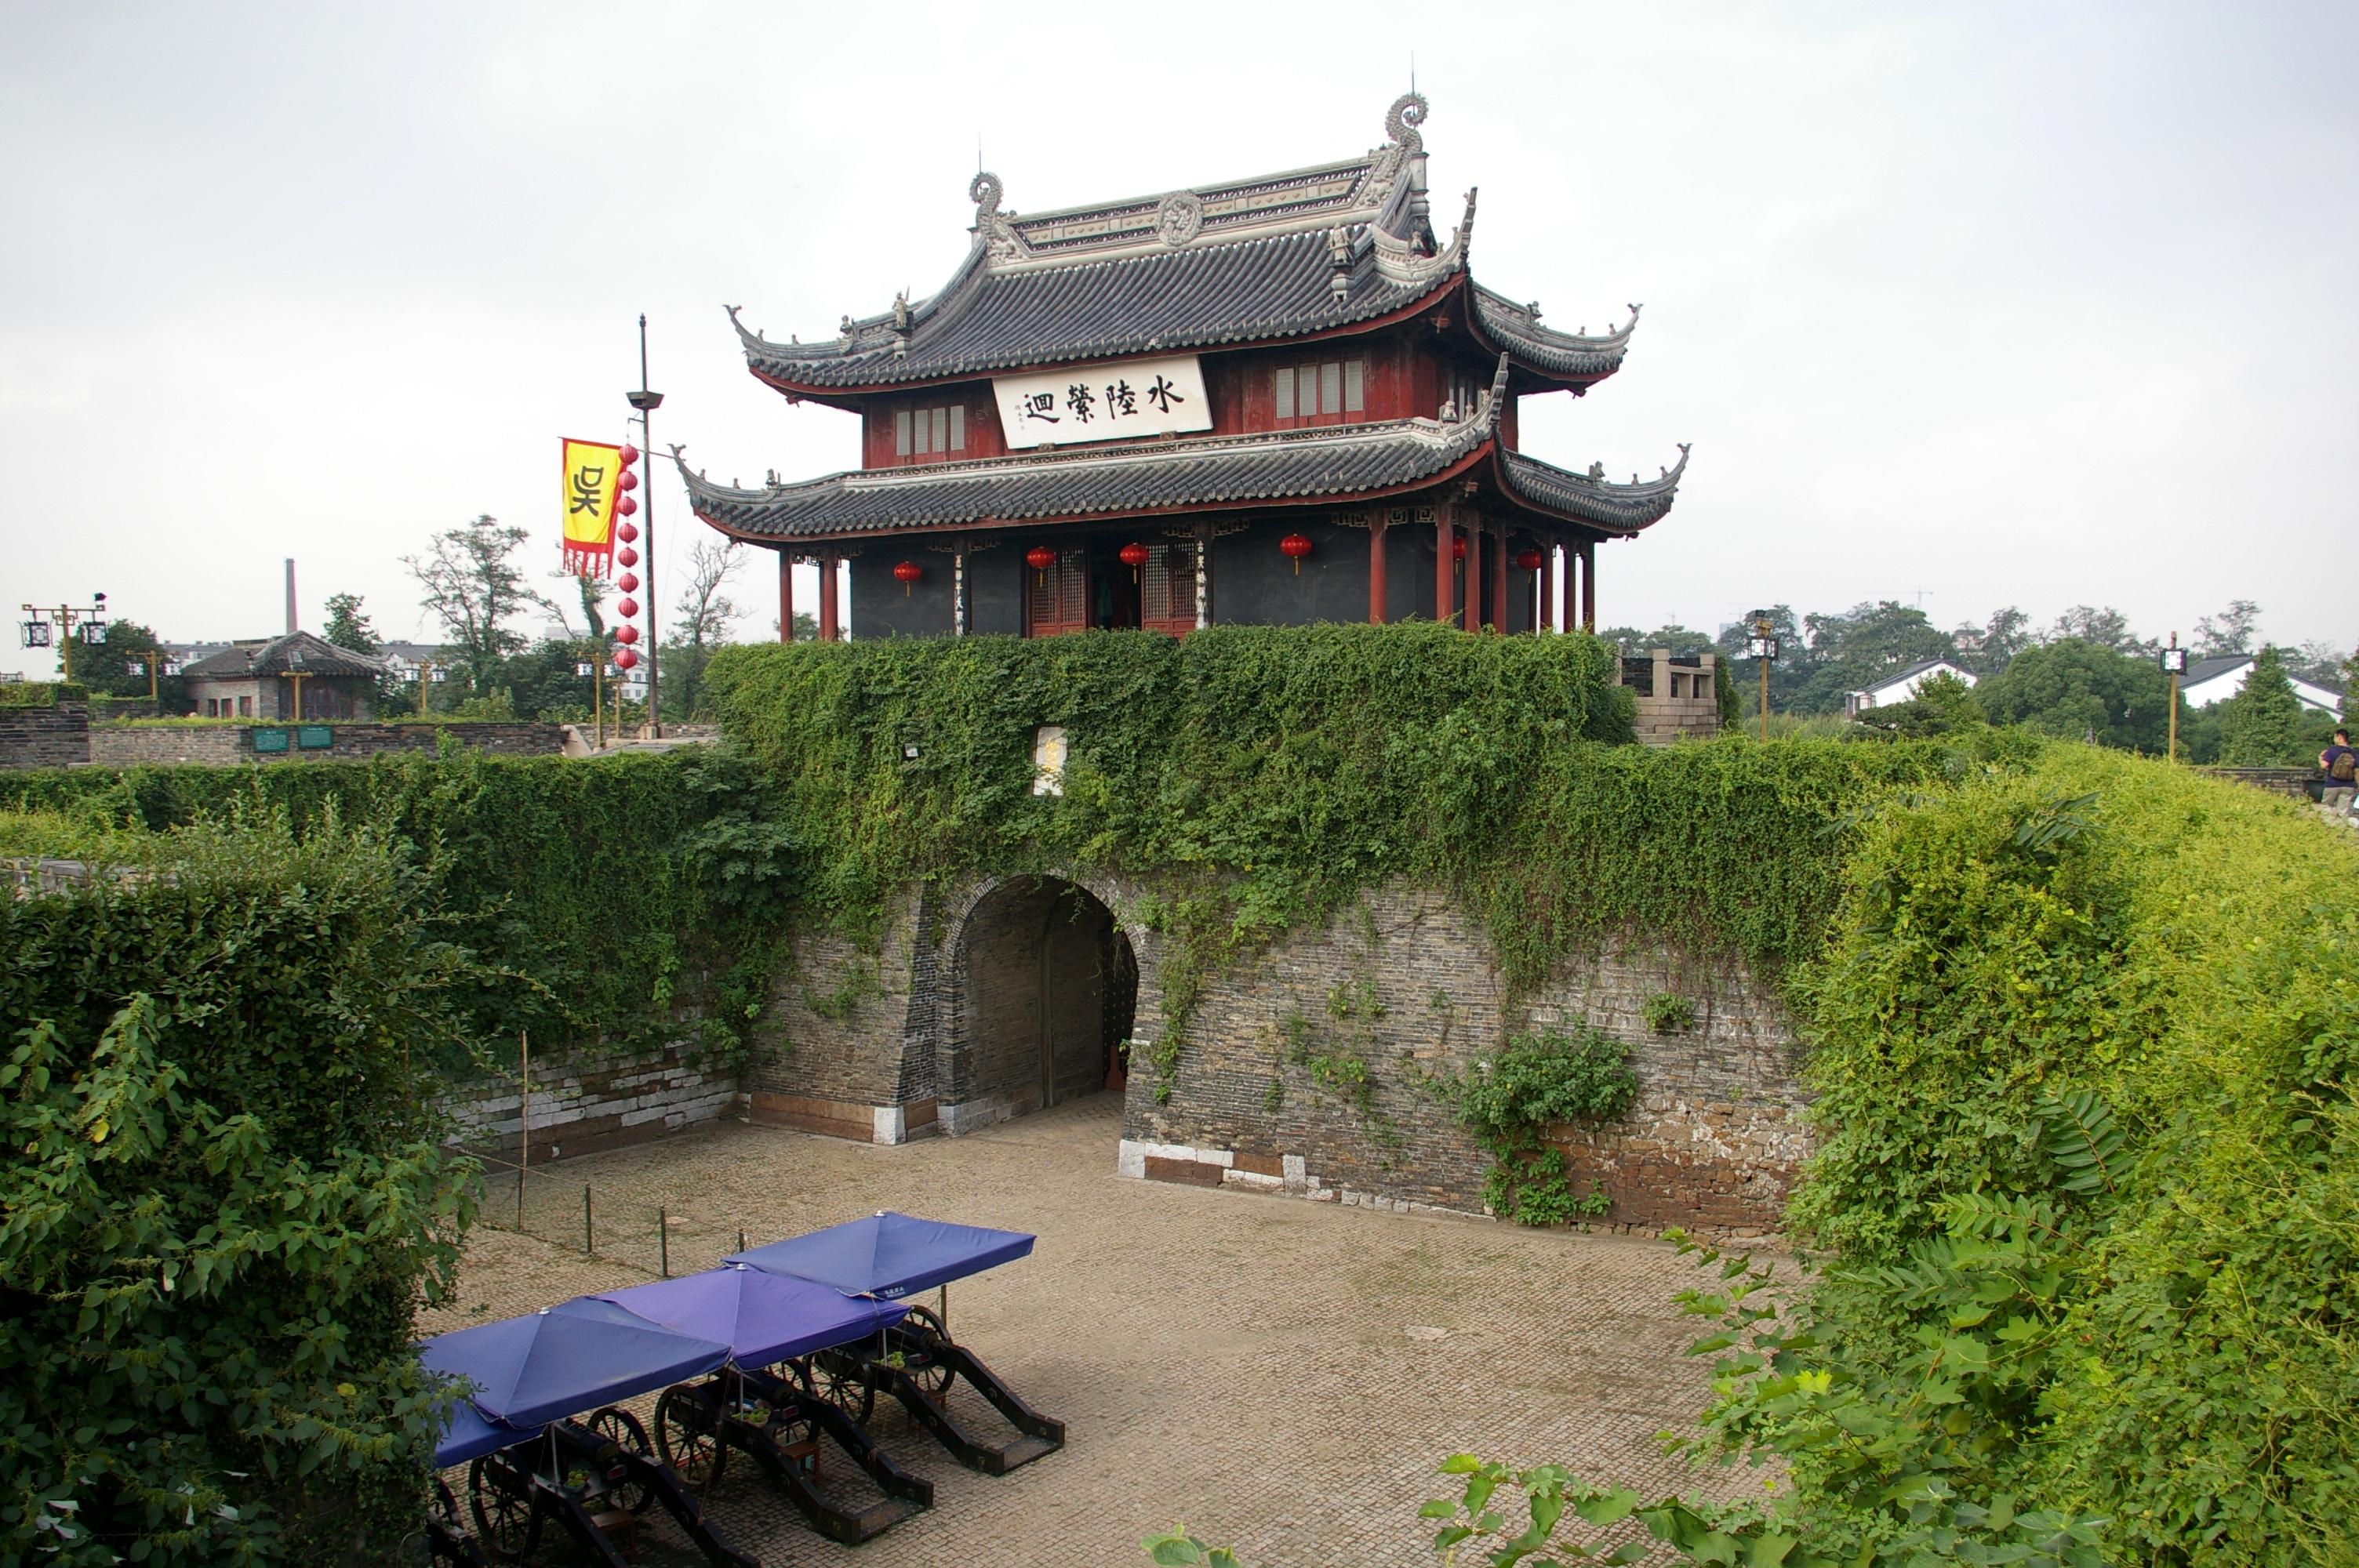 20090926 Suzhou Pan Men 5888.jpg